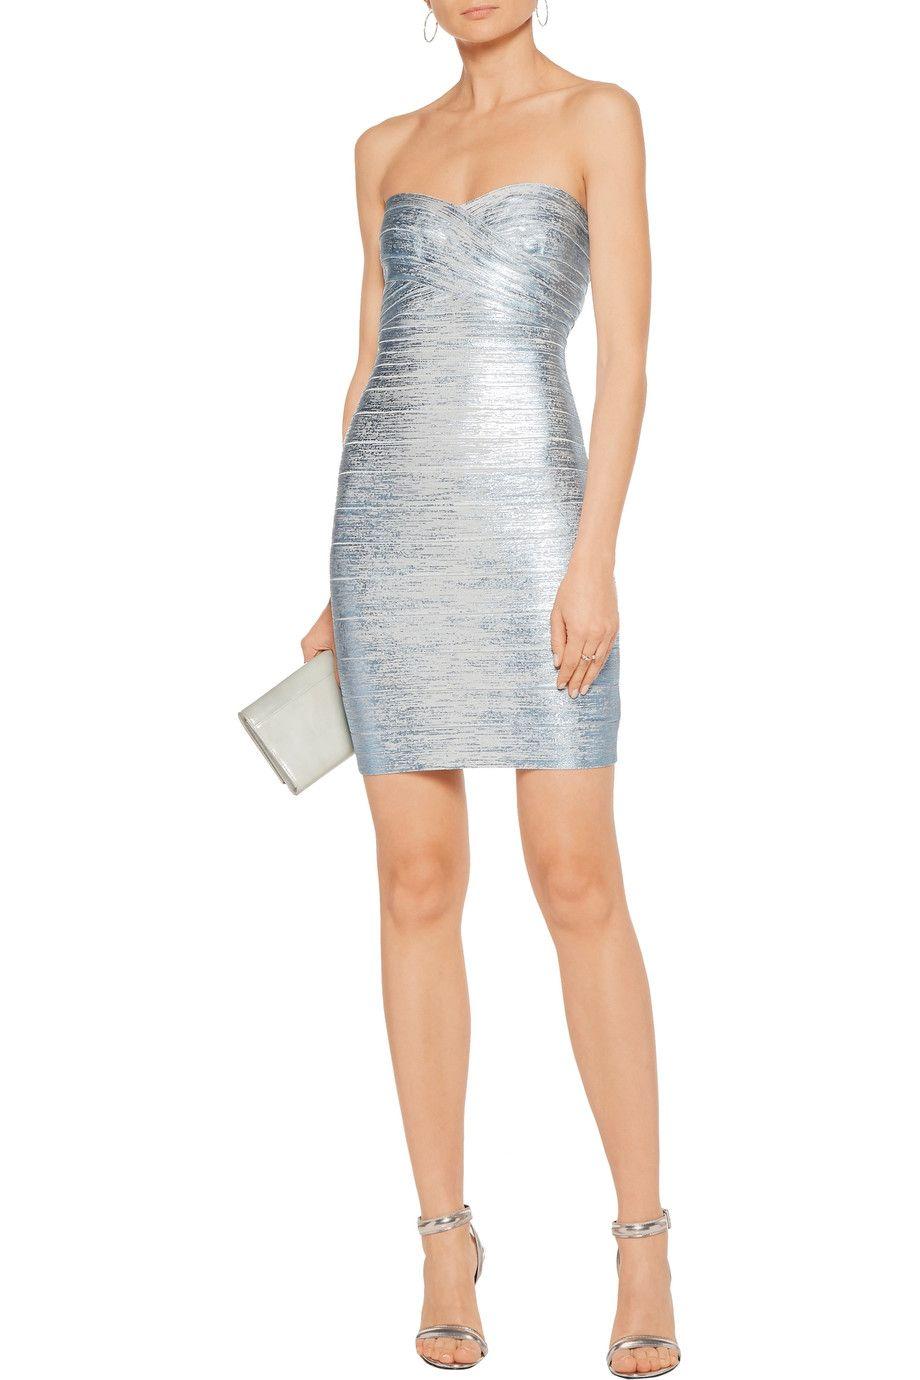 7638240decf17 Shop on-sale Hervé Léger Nazik metallic coated-bandage mini dress. Browse  other discount designer Dresses   more on The Most Fashionable Fashion  Outlet